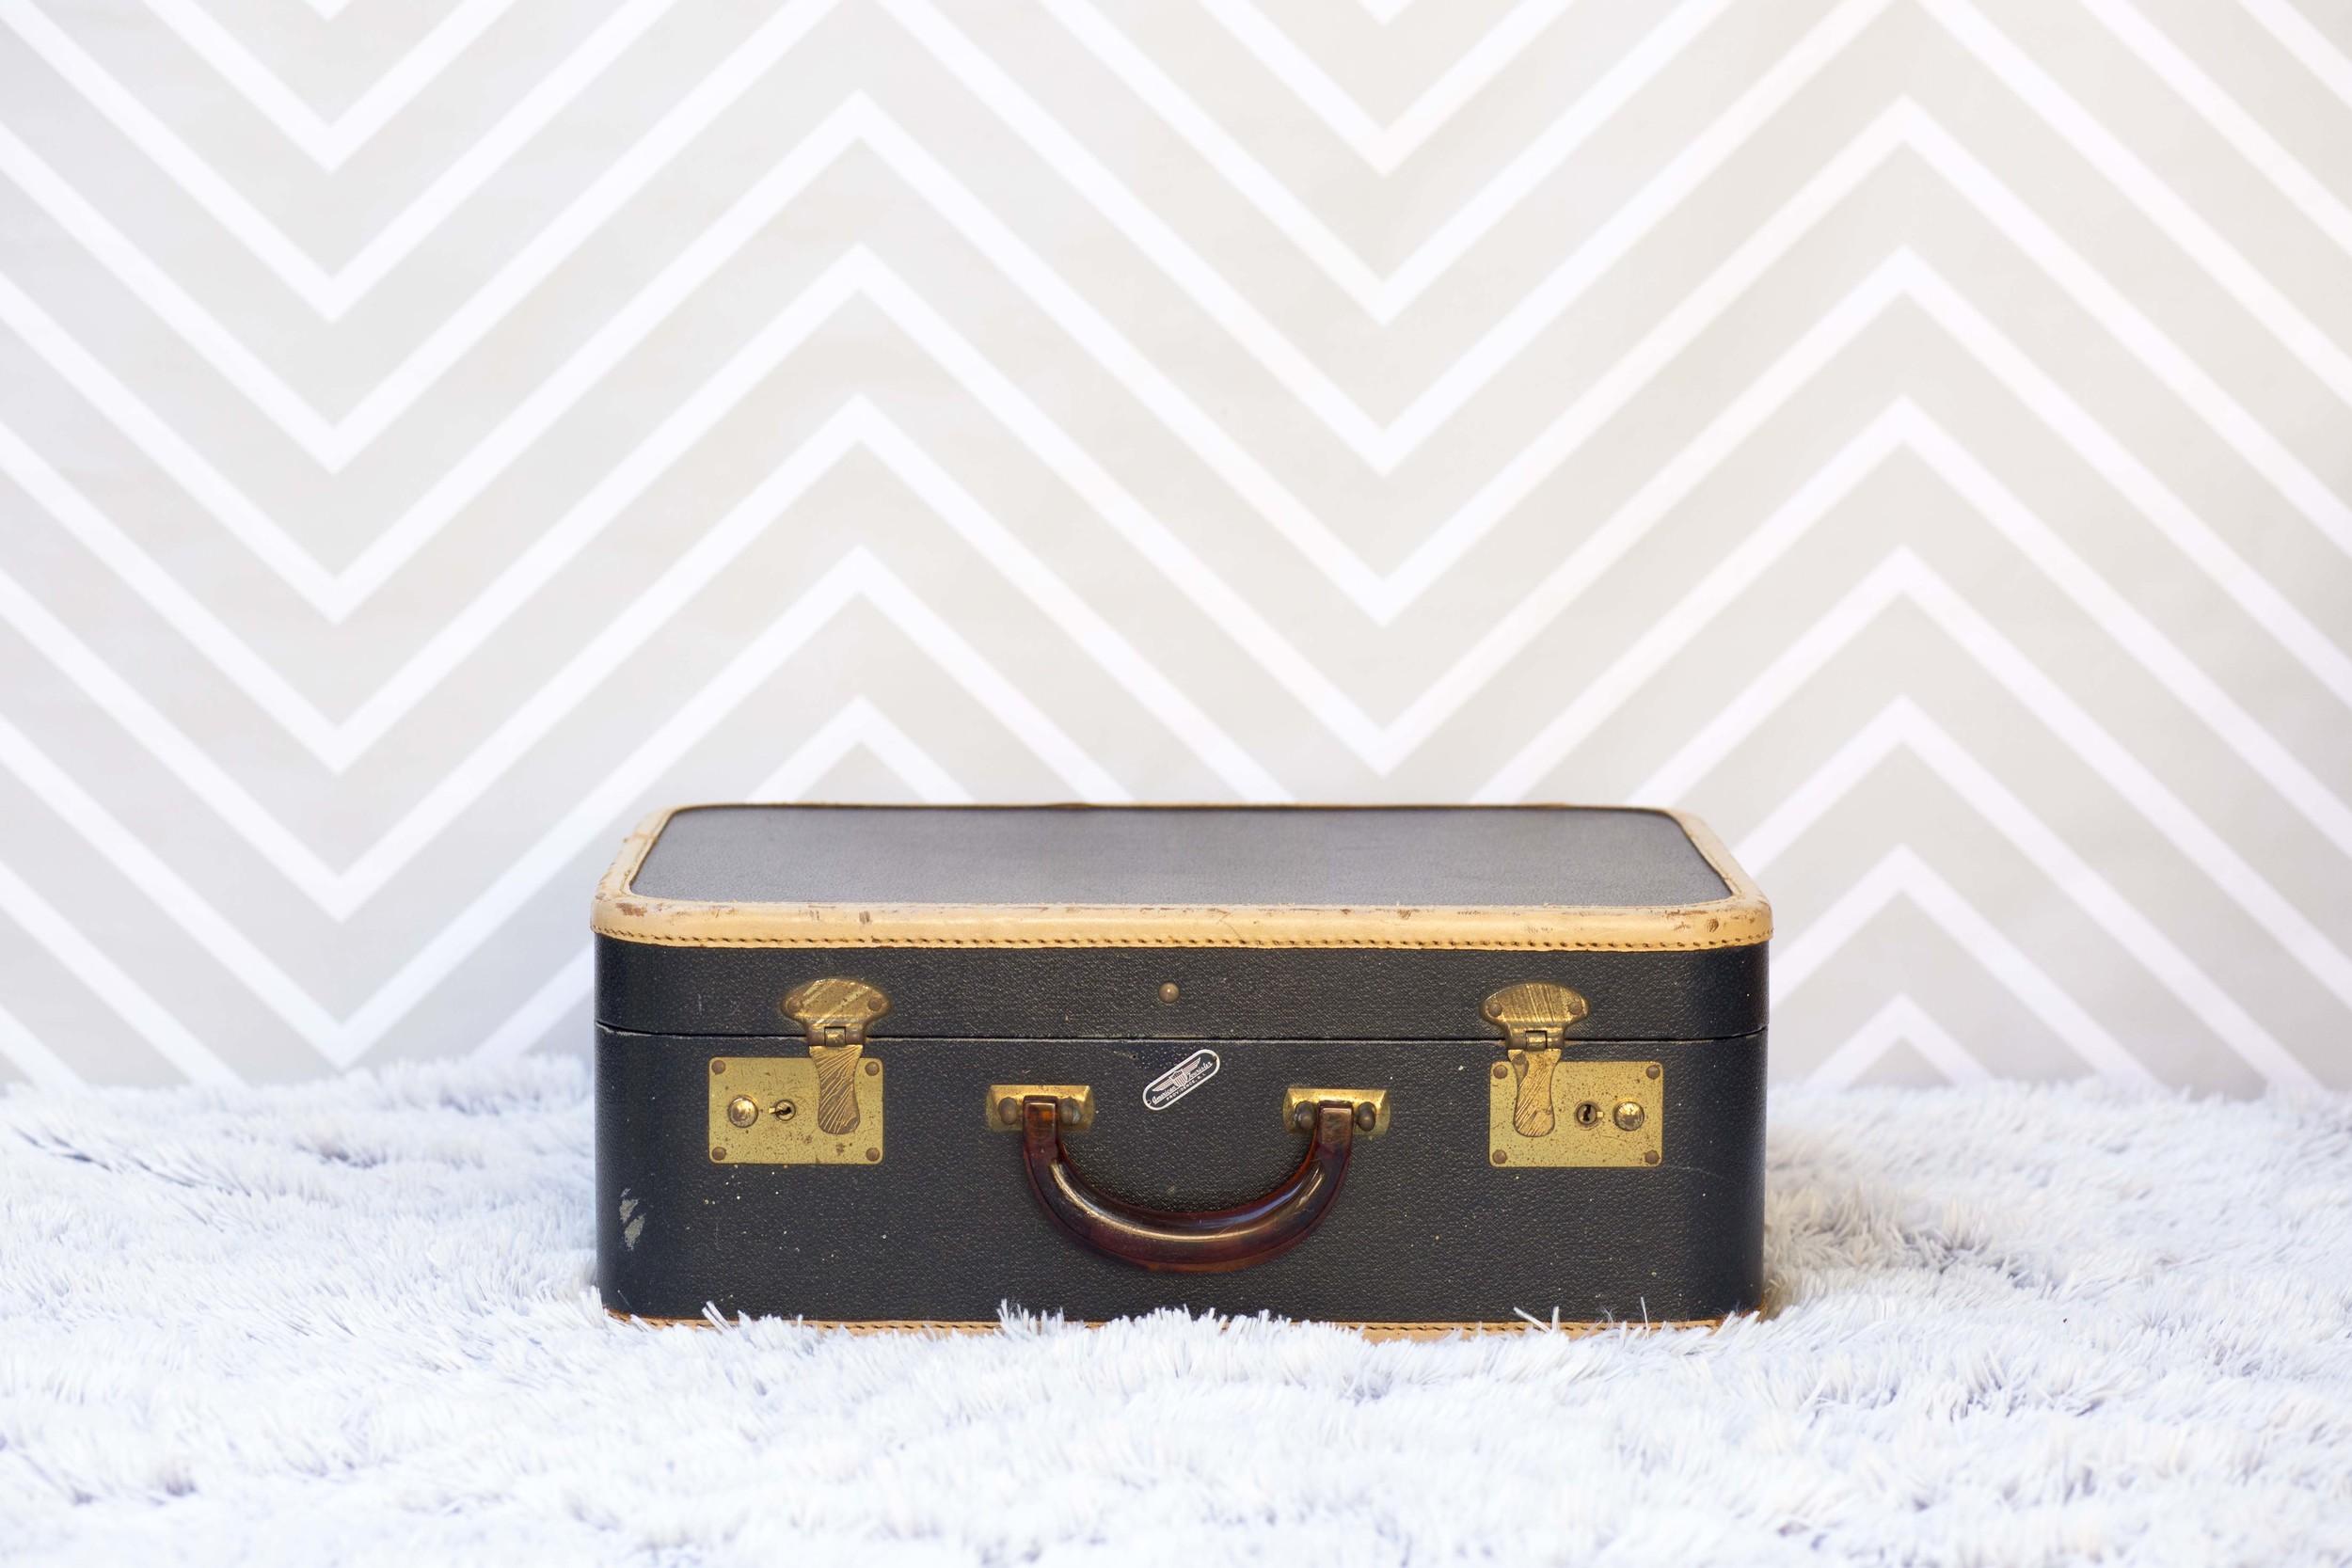 SuitcaseSample328A5039.jpg